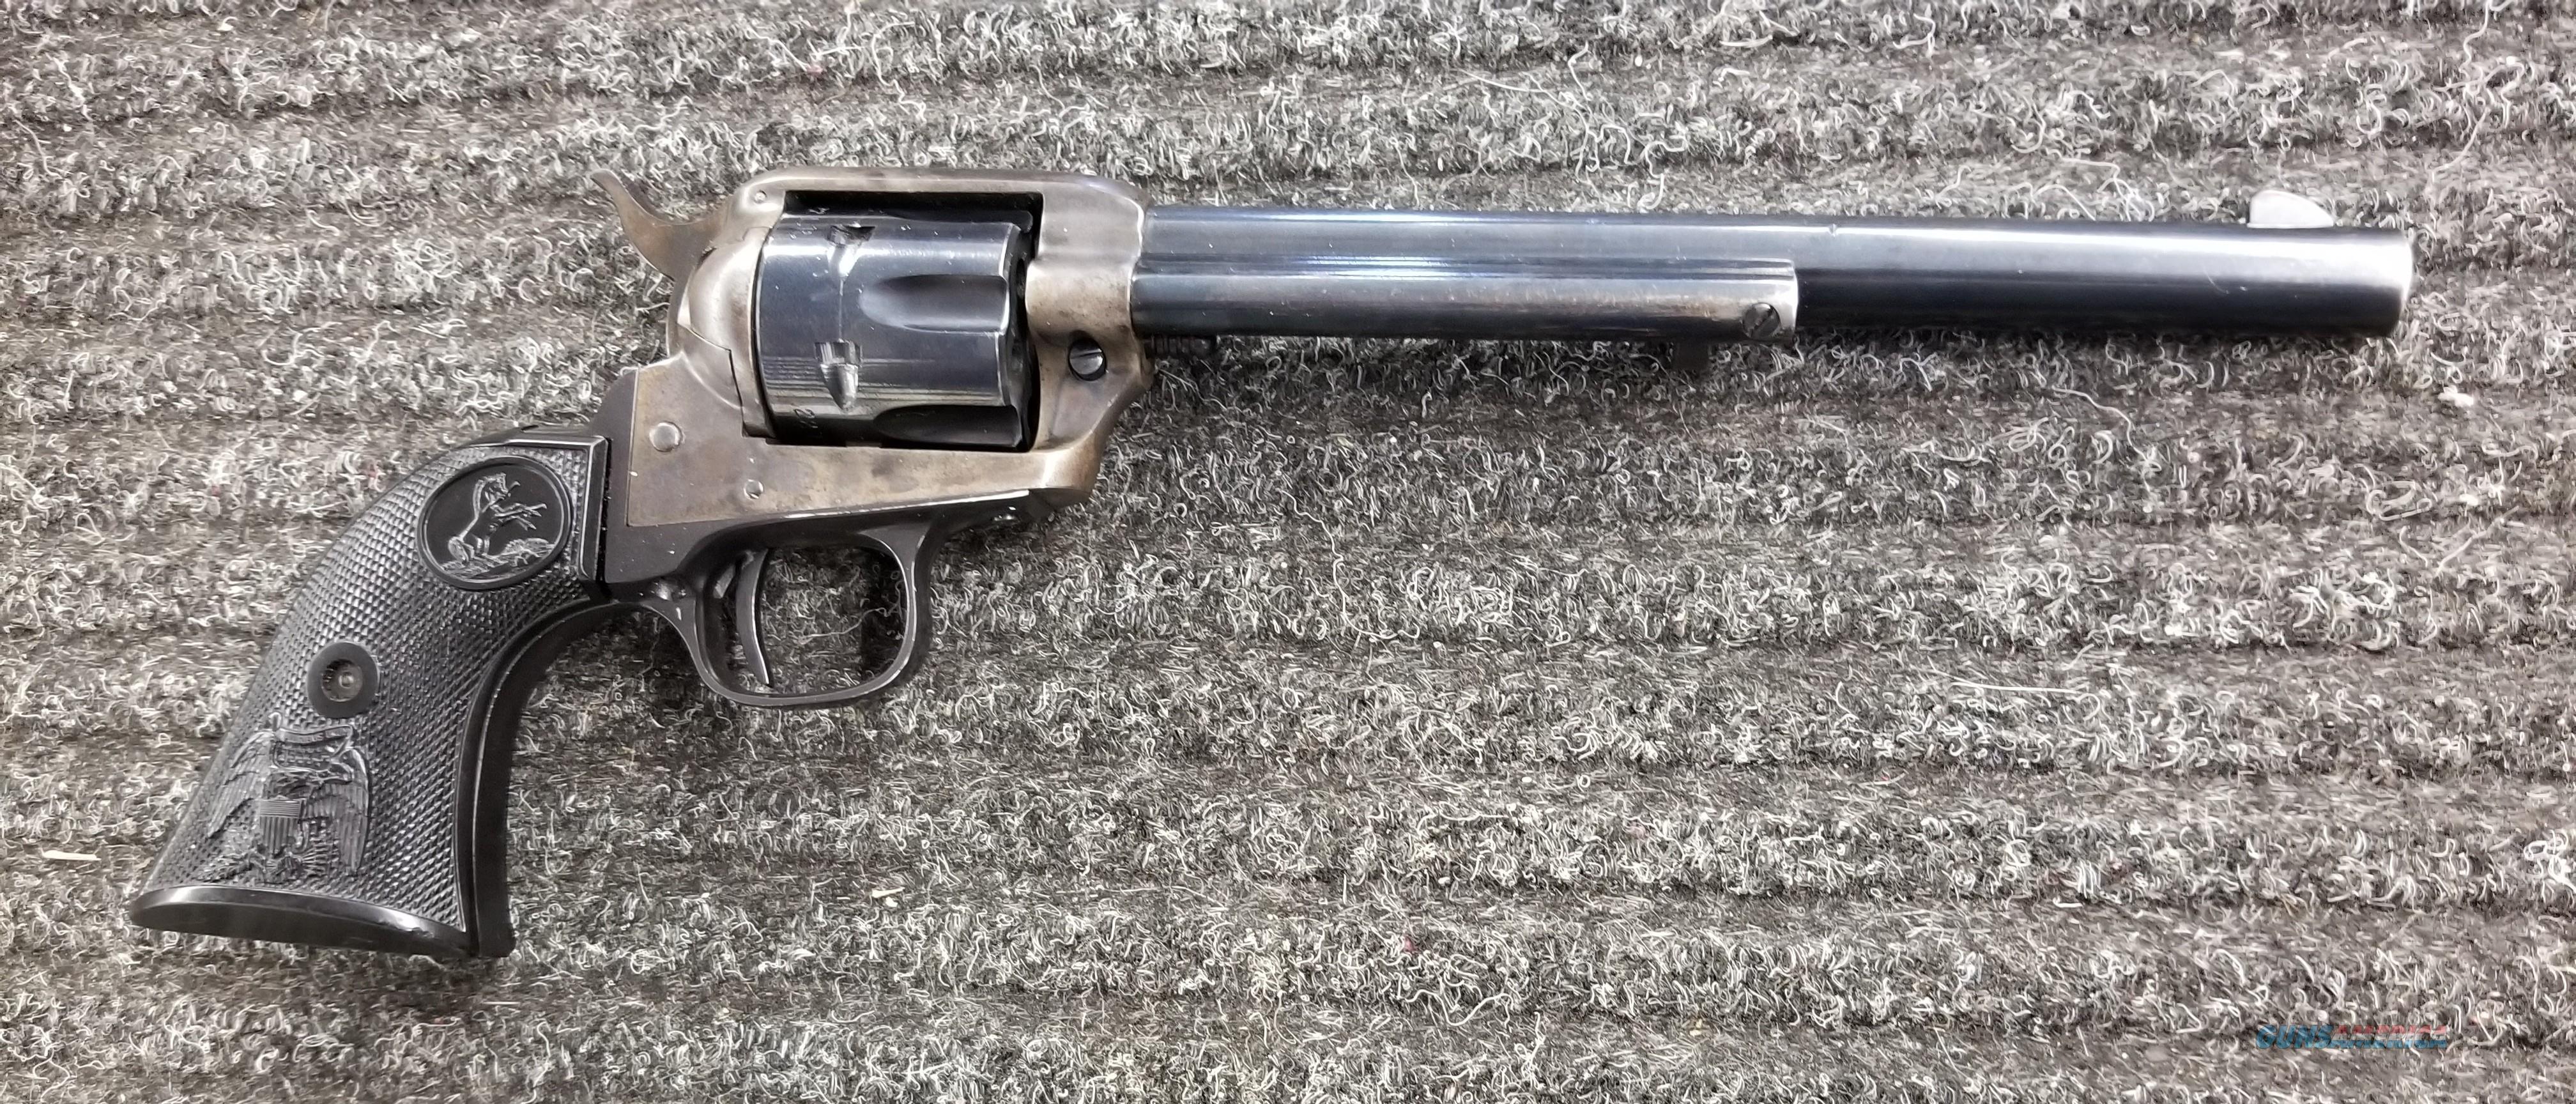 Colt Buntline Peacemaker 22LR Revolver  -  Free Shipping  Guns > Pistols > Colt Single Action Revolvers - Modern (22 Cal.)